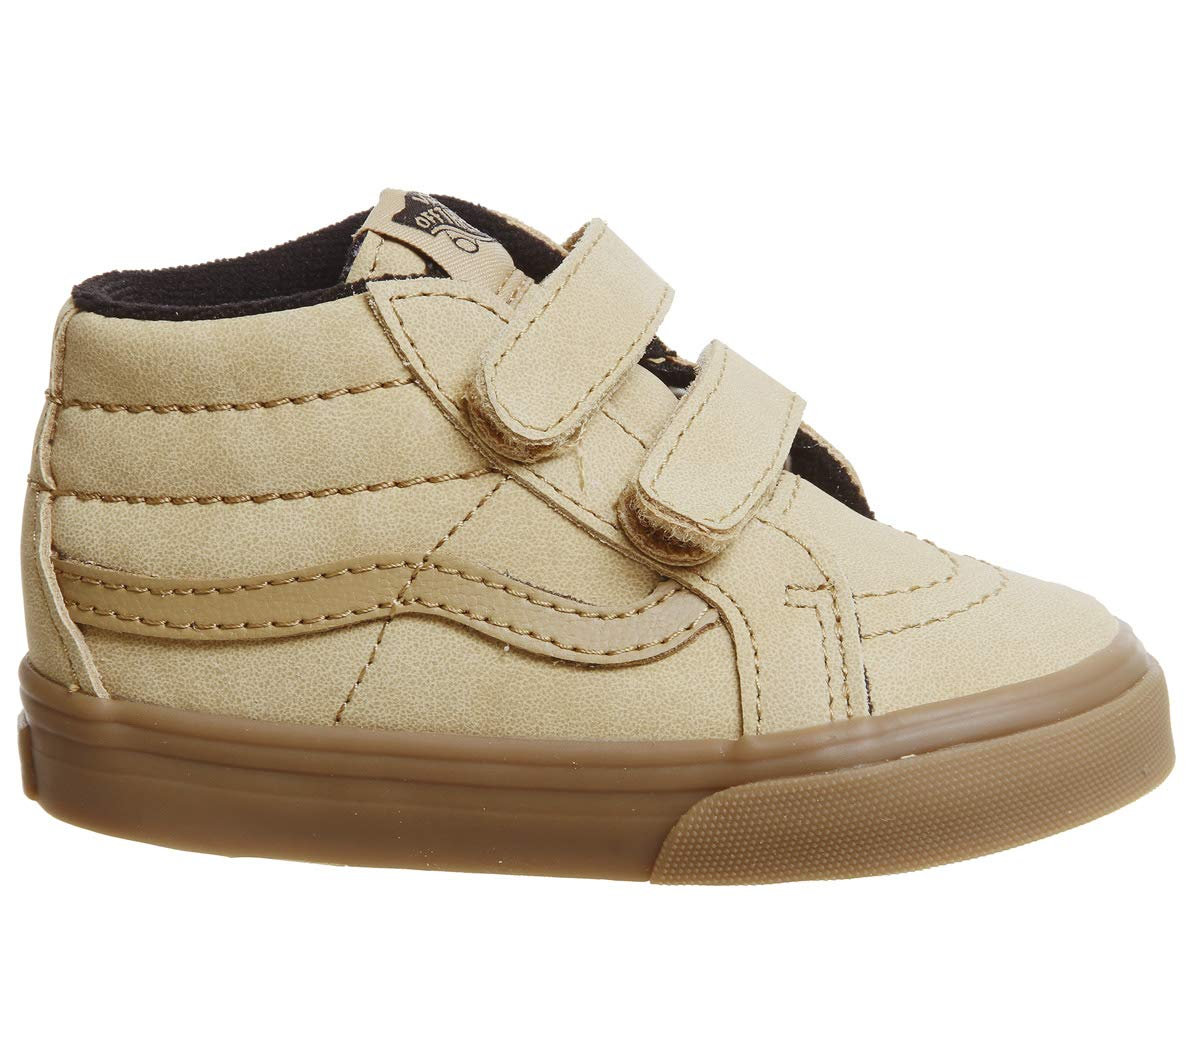 b563f0b7fc5f Vans Sk8-Mid Reissue V  Amazon.co.uk  Shoes   Bags